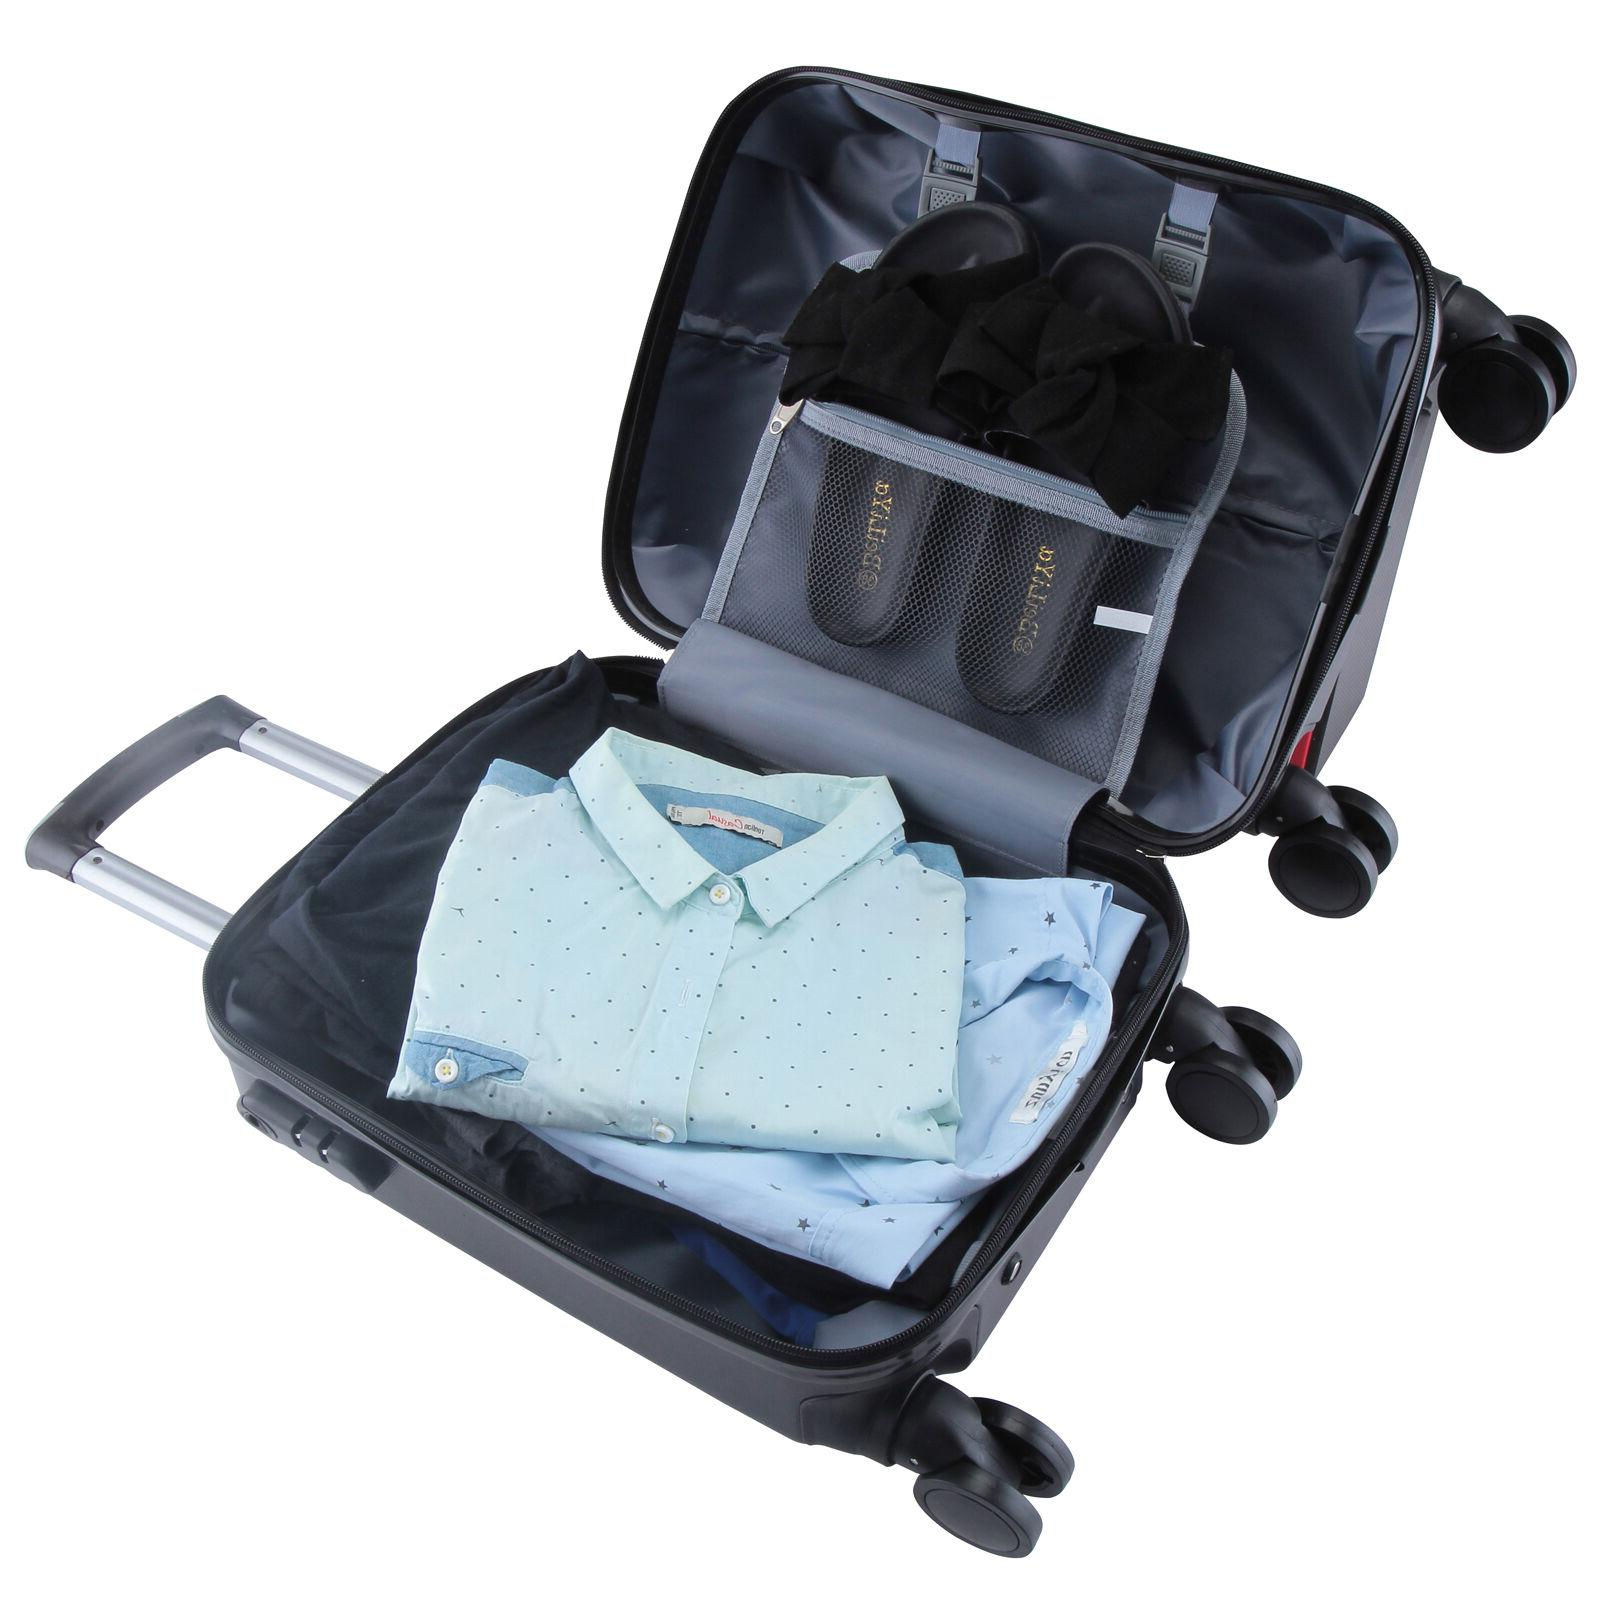 4Pcs Carry On Travel Bag